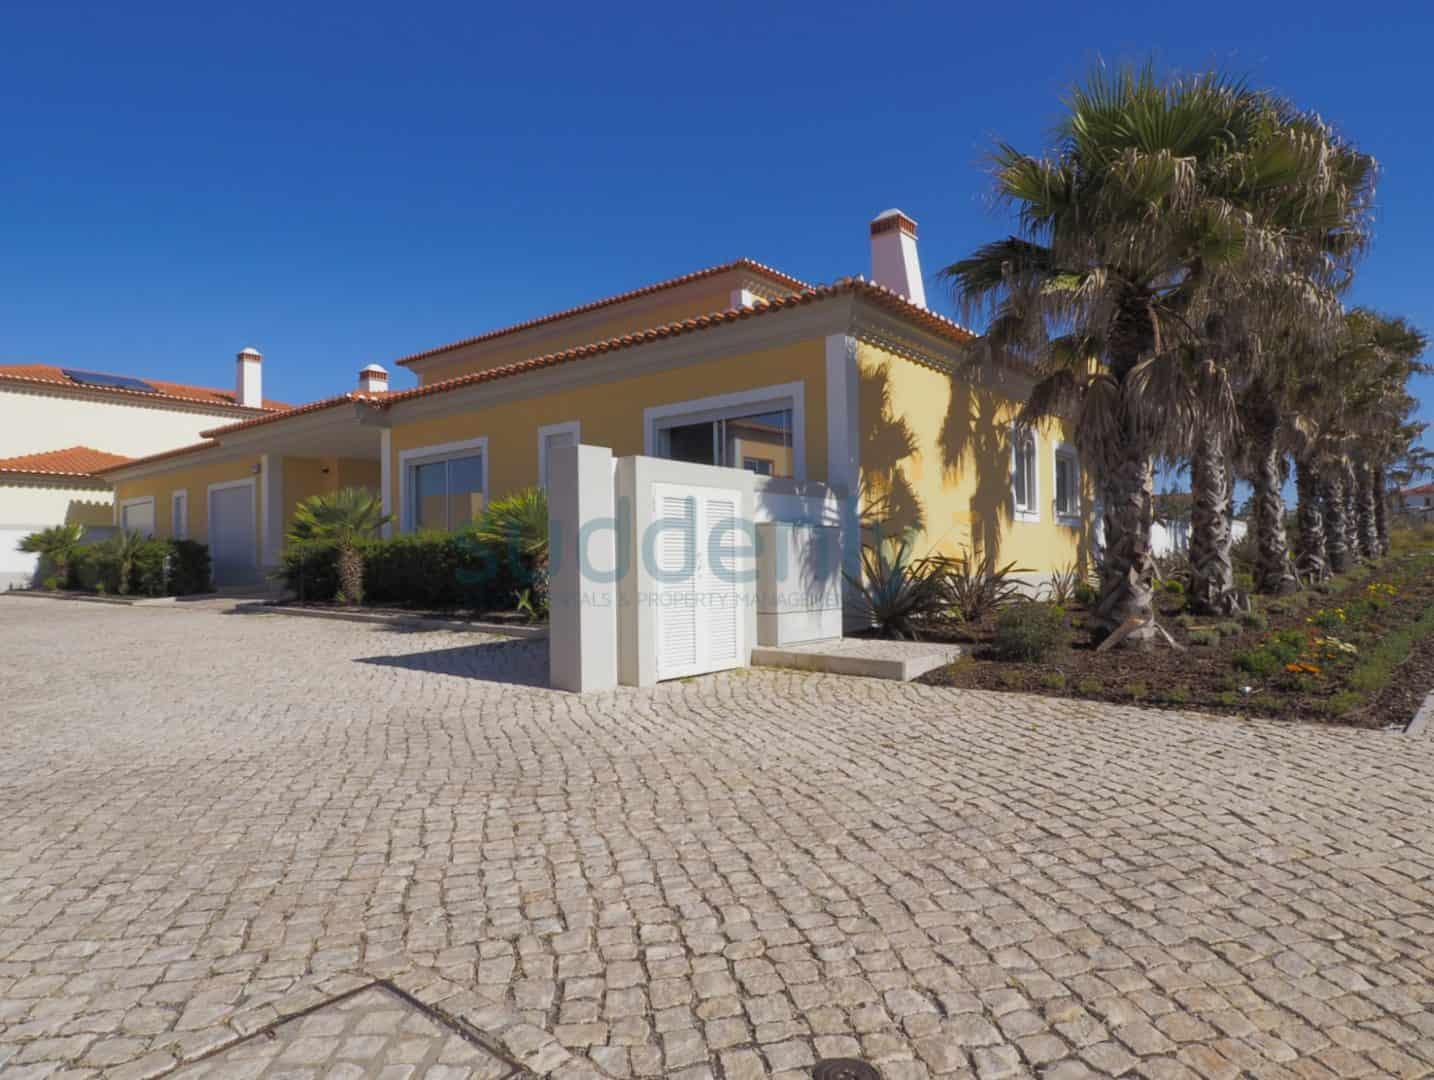 Villas 407